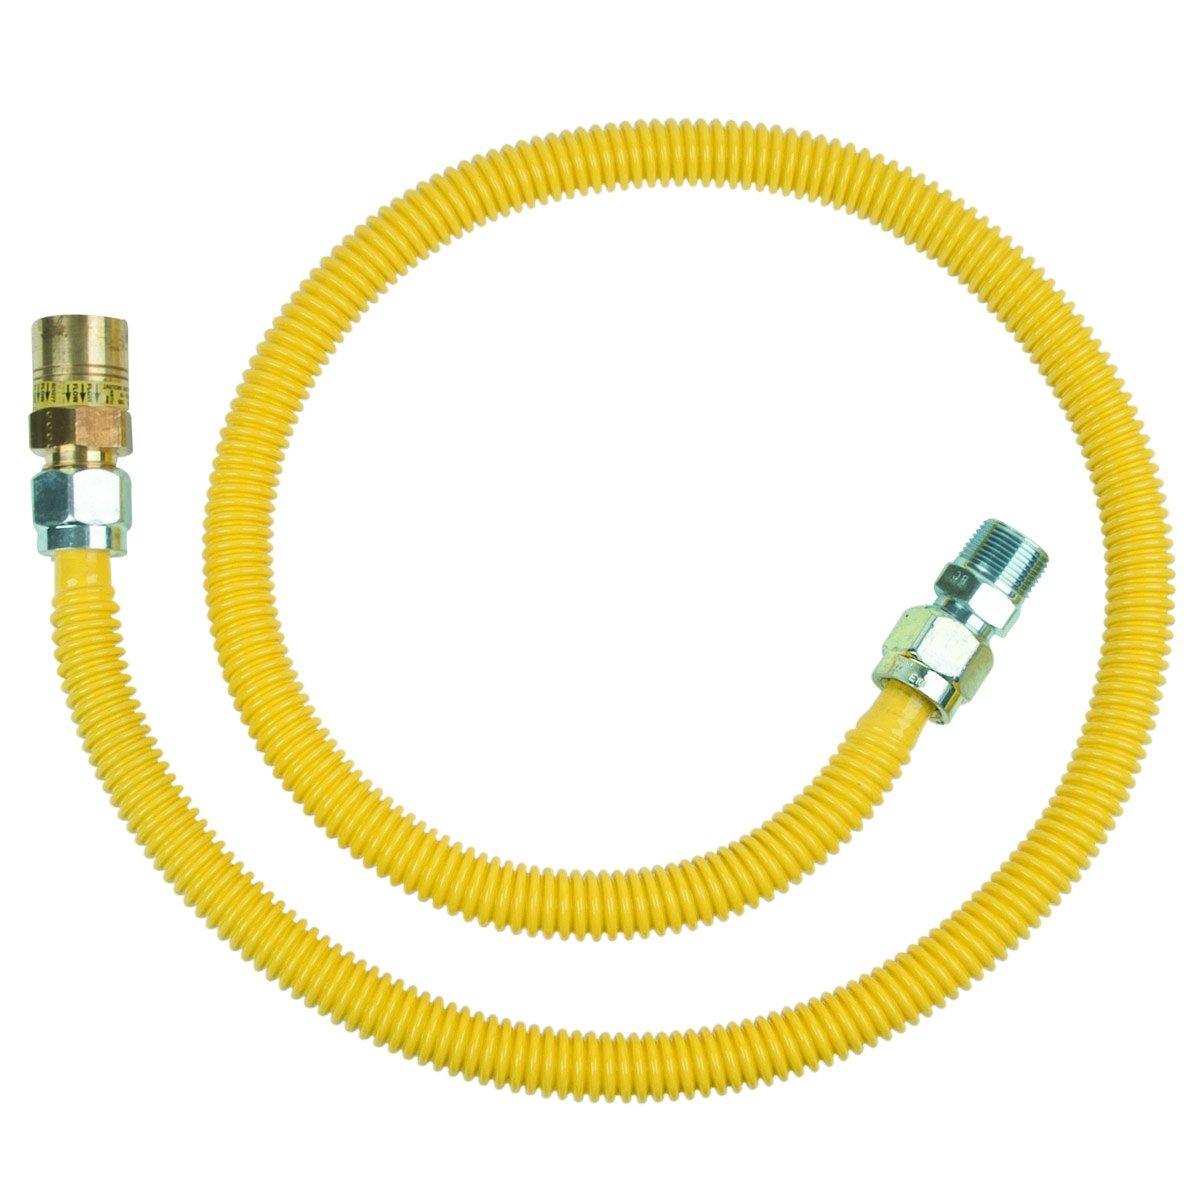 BrassCraft CSSC91E-48 P 5/8-Inch, Female Flare EFV x 3/4-Inch MIP x 36-Inch Safety+PLUS Gas Connector, 5/8-Inch, OD 106,000 BTU